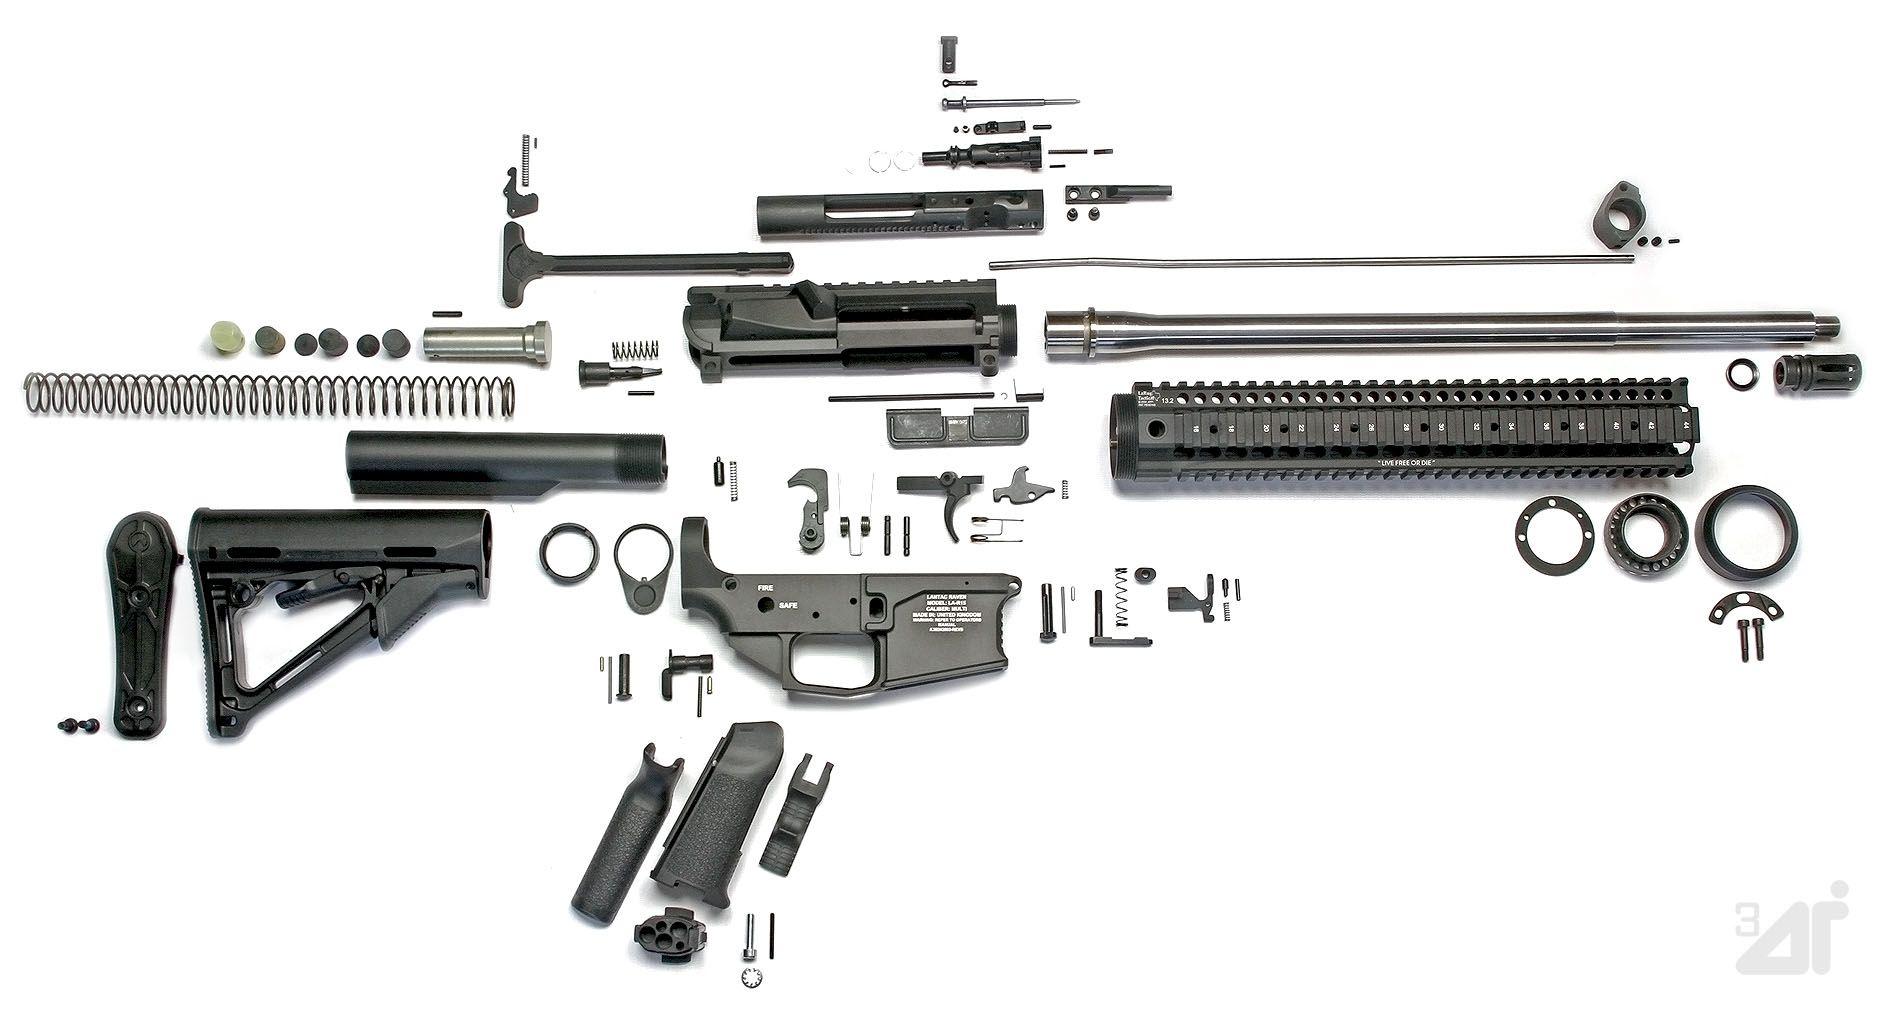 Download Wallpaper 1920x1080 Automaton, Magpul, Ar-15, Bullets ...